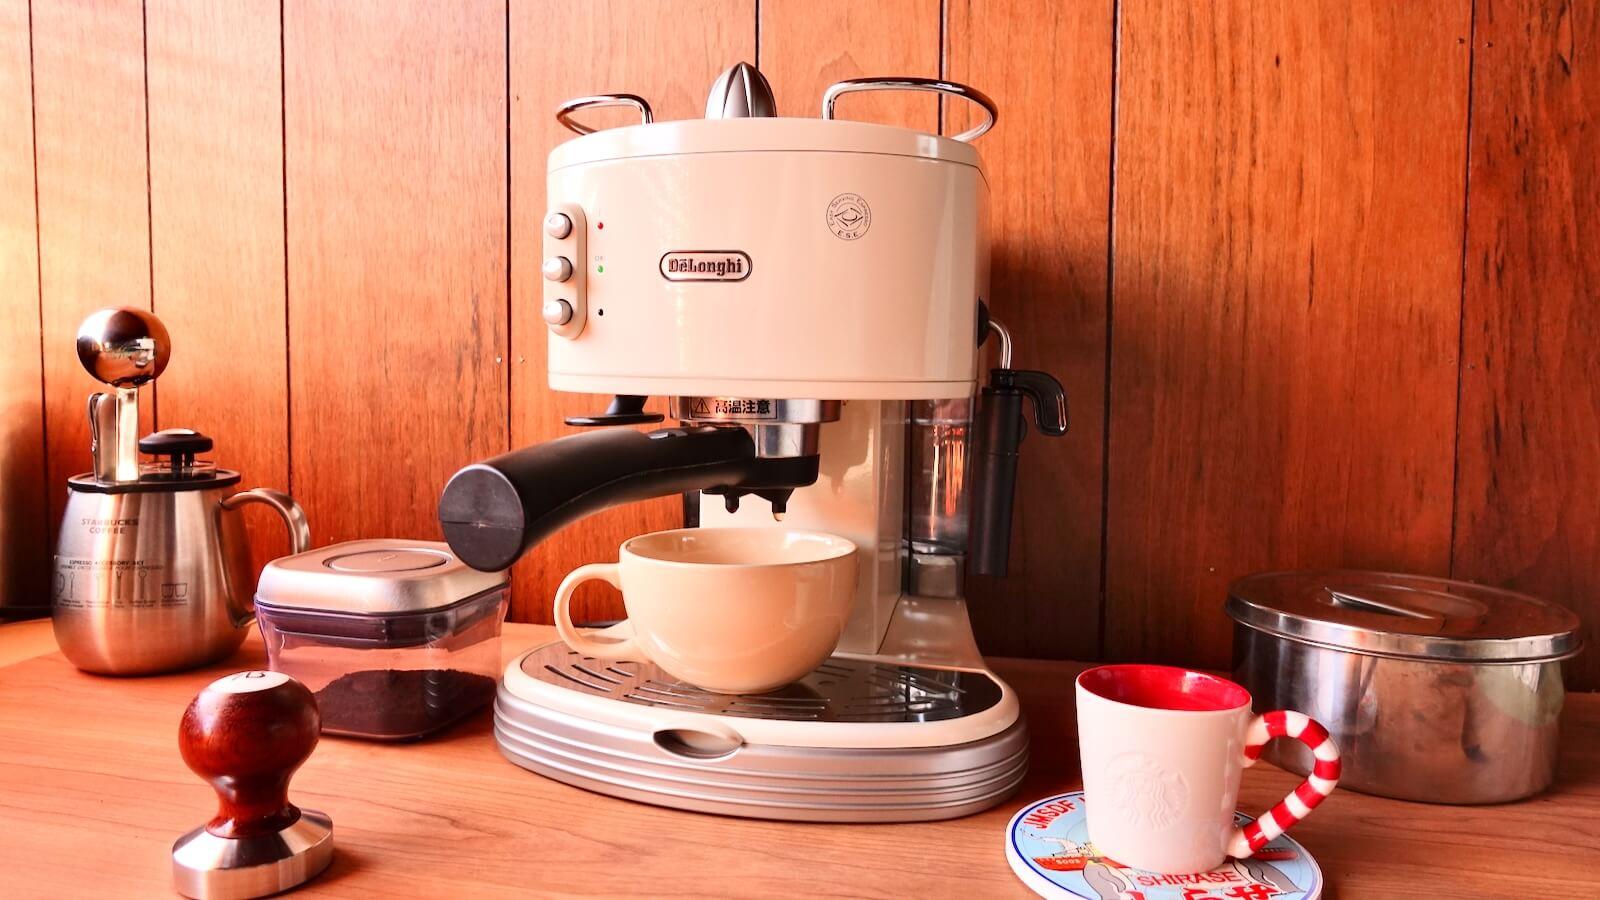 Delonghi espresso machine ECM300J with cup set